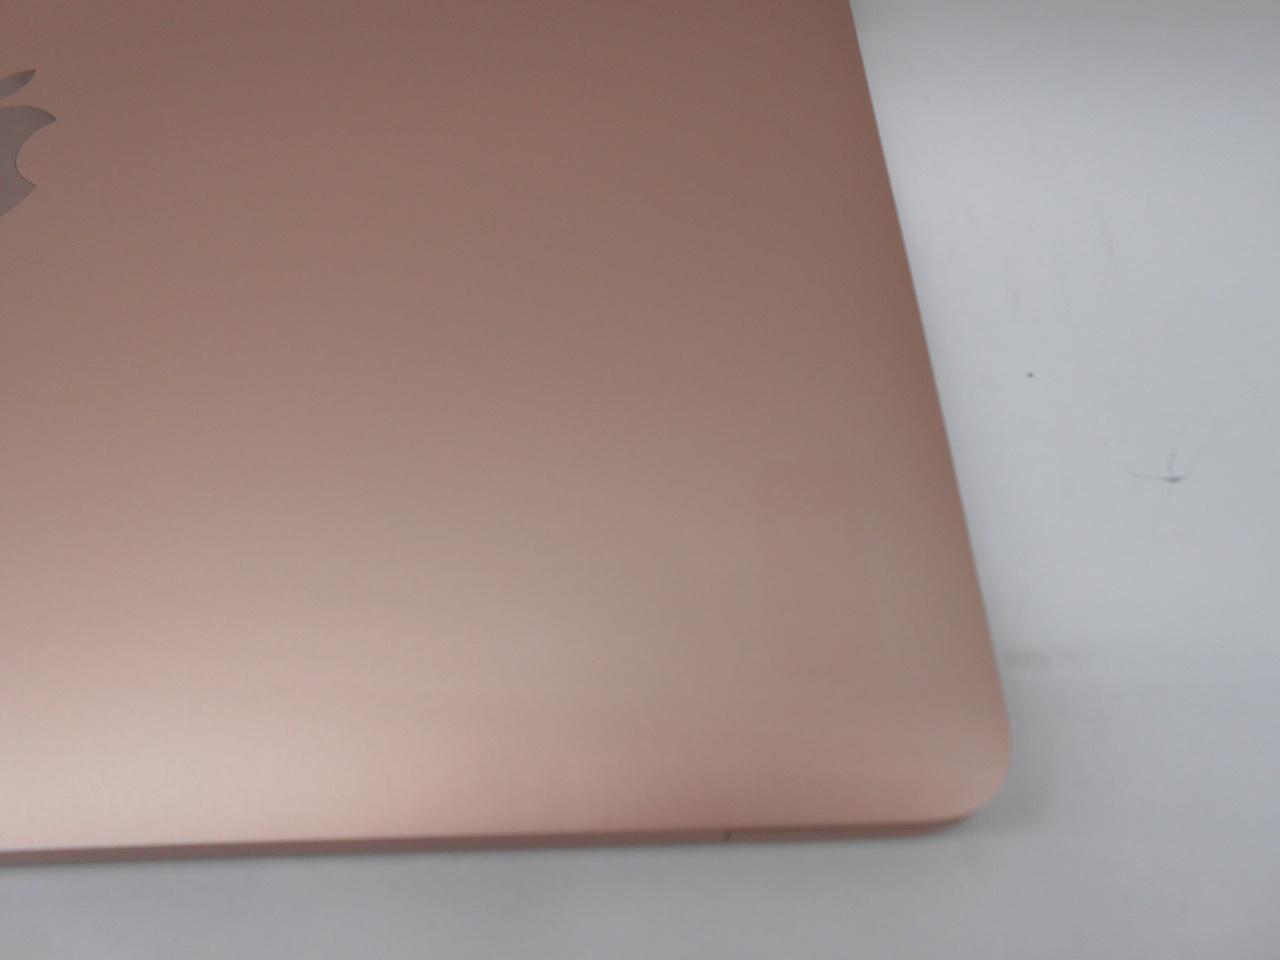 Bランク【中古】 Apple MacBookAir MREE2J/A/Late2018/Corei5 1.6GHz/メモリ8GB/SSD128GB/13インチ/Mac OS Mojave【3ヶ月保証】【足立店発送】